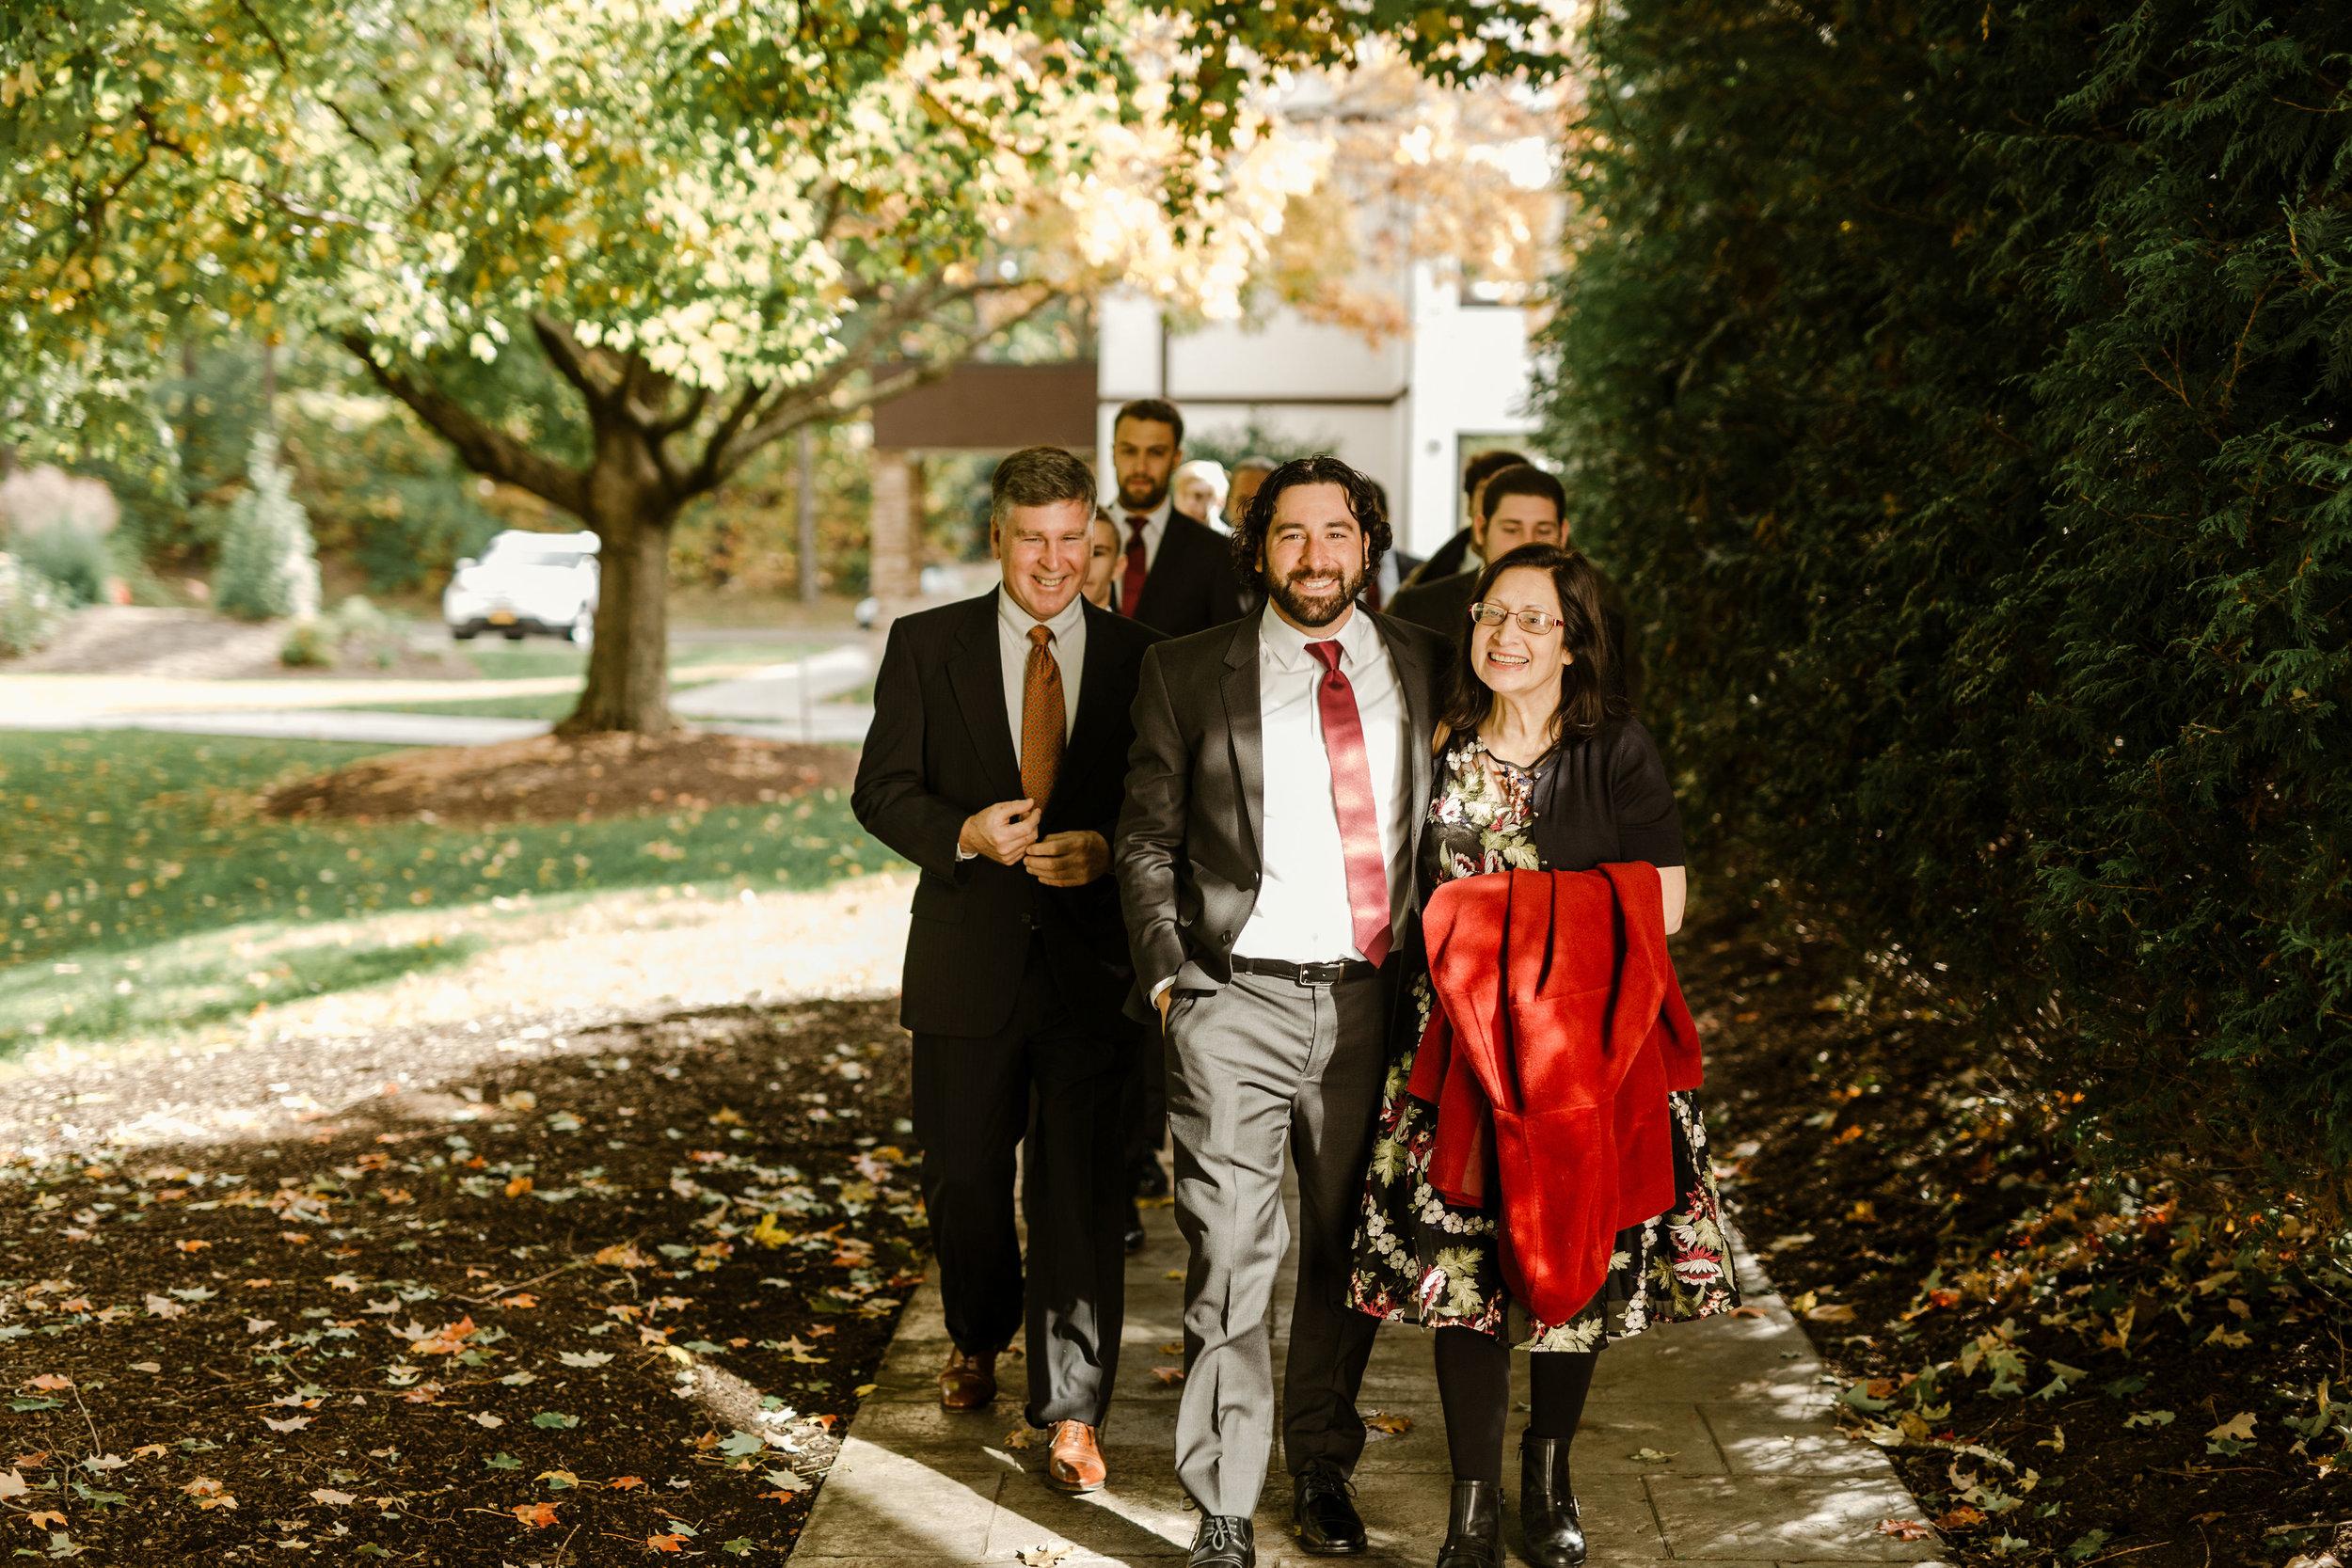 young-love-media-rustic-fall-autumn-wedding-emmerich-tree-farm-hudson-valley-warwick-new-york-getting-ready-56.jpg